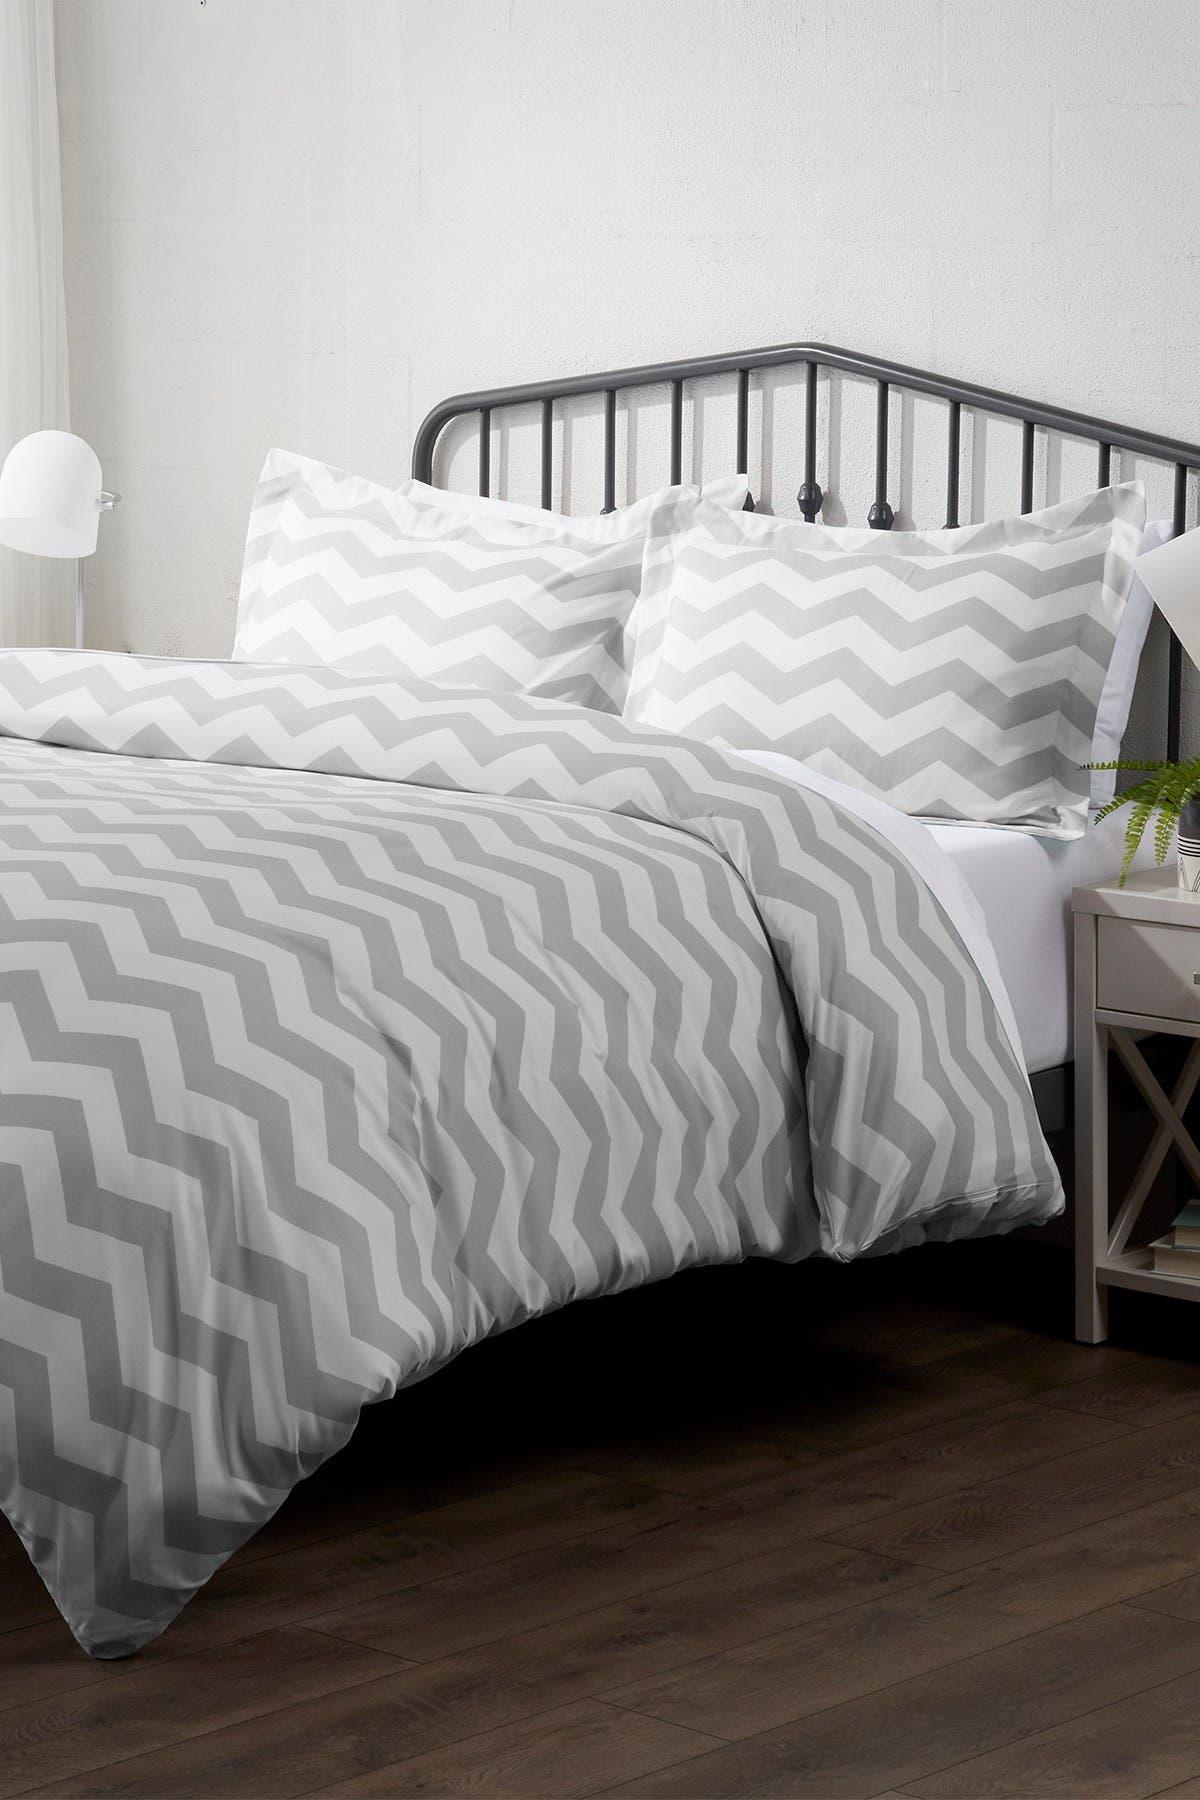 Image of IENJOY HOME Home Spun Premium Ultra Soft Arrow Pattern 2-Piece Twin Duvet Cover Set - Gray